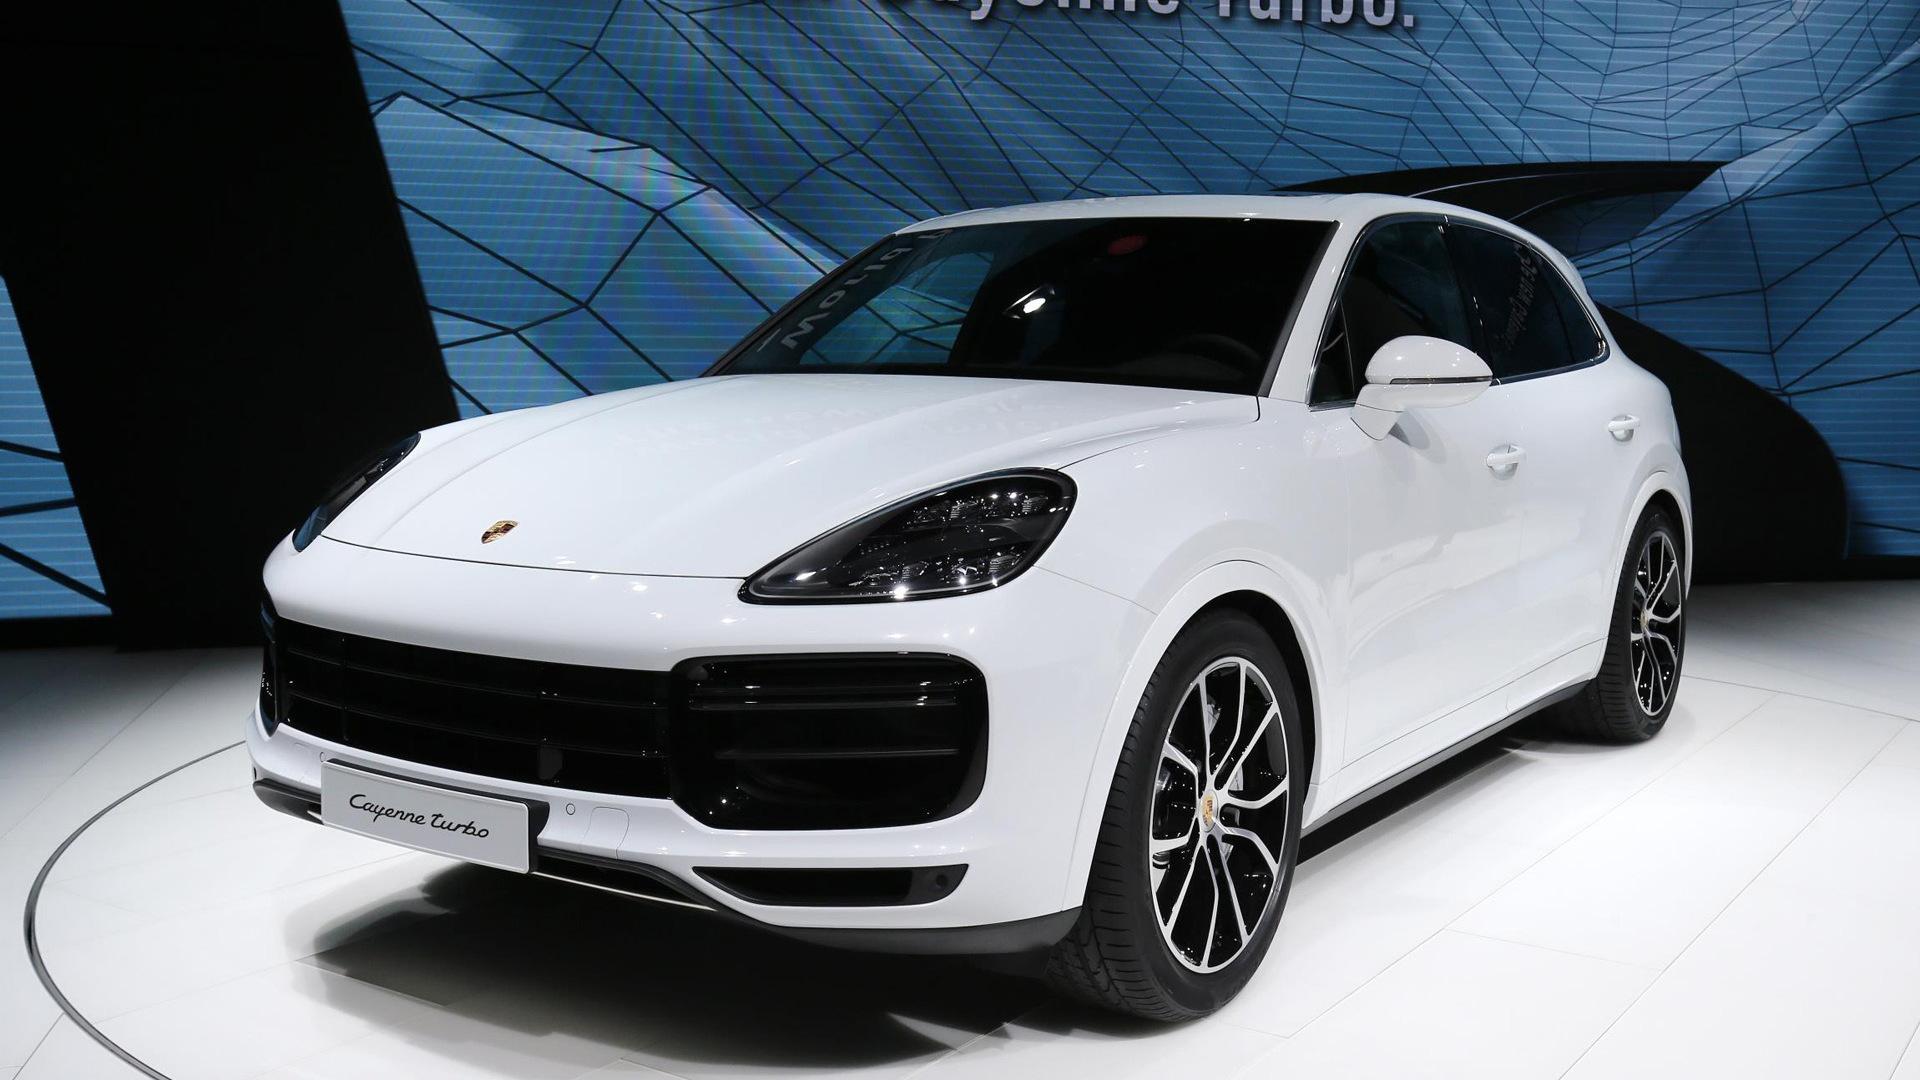 2019 Porsche Cayenne Turbo, 2017 2017 Frankfurt Motor Show